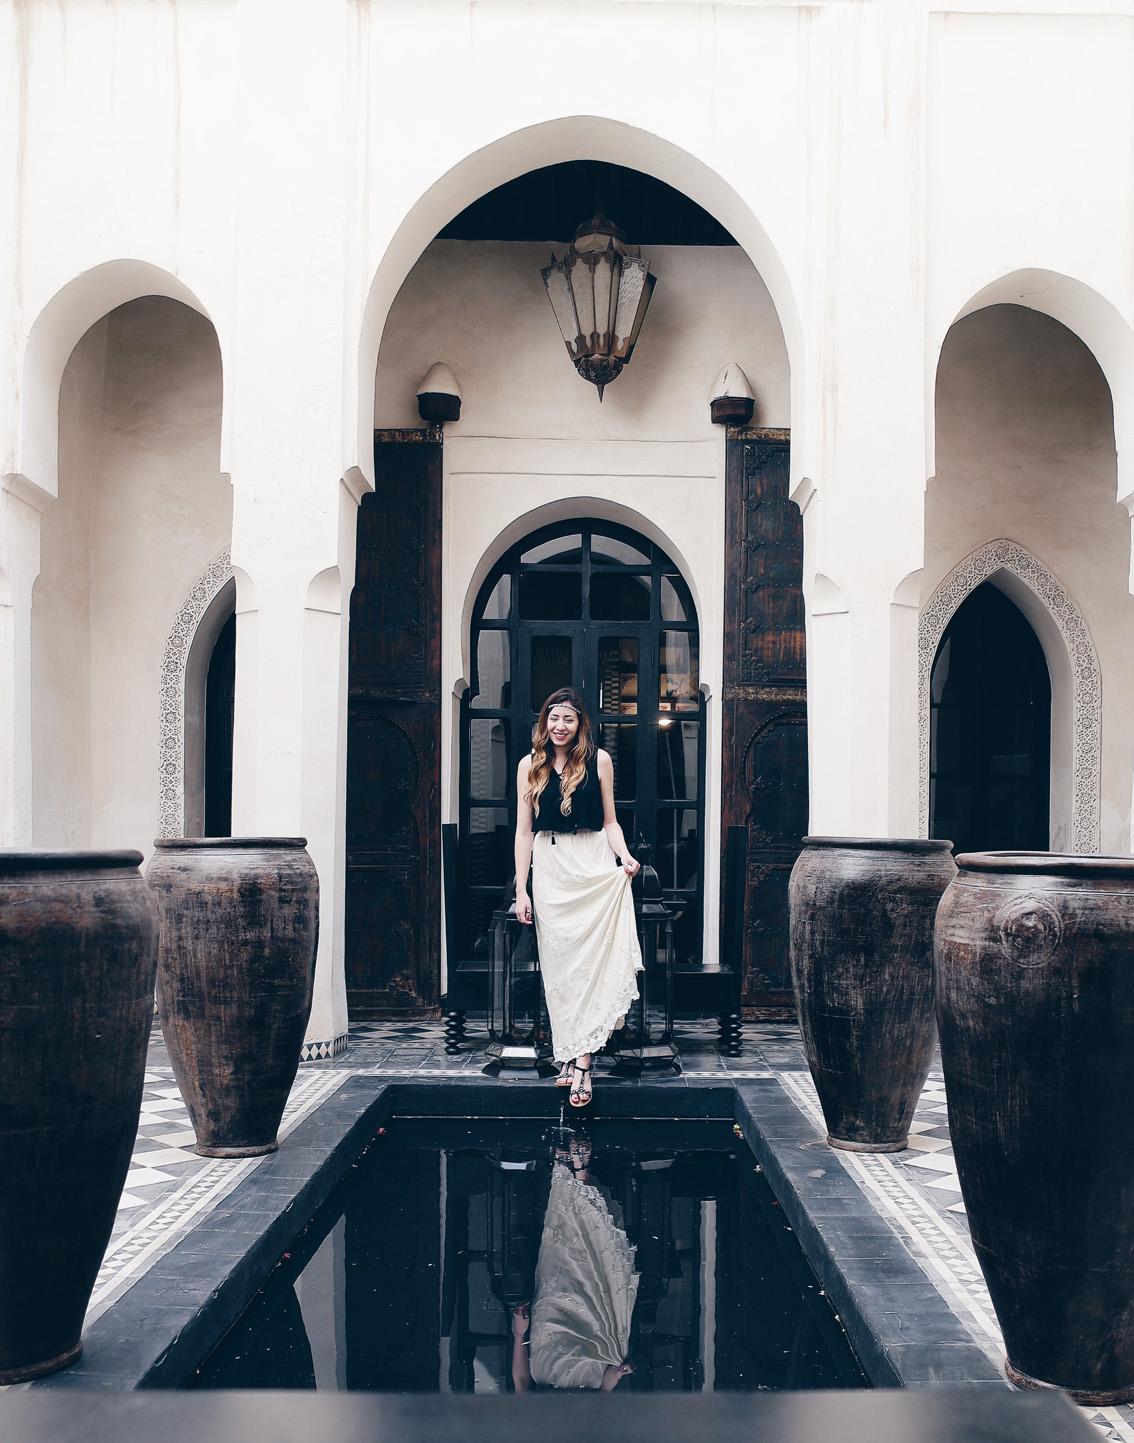 17 My Marrakech experience: Riad Dar Darma.